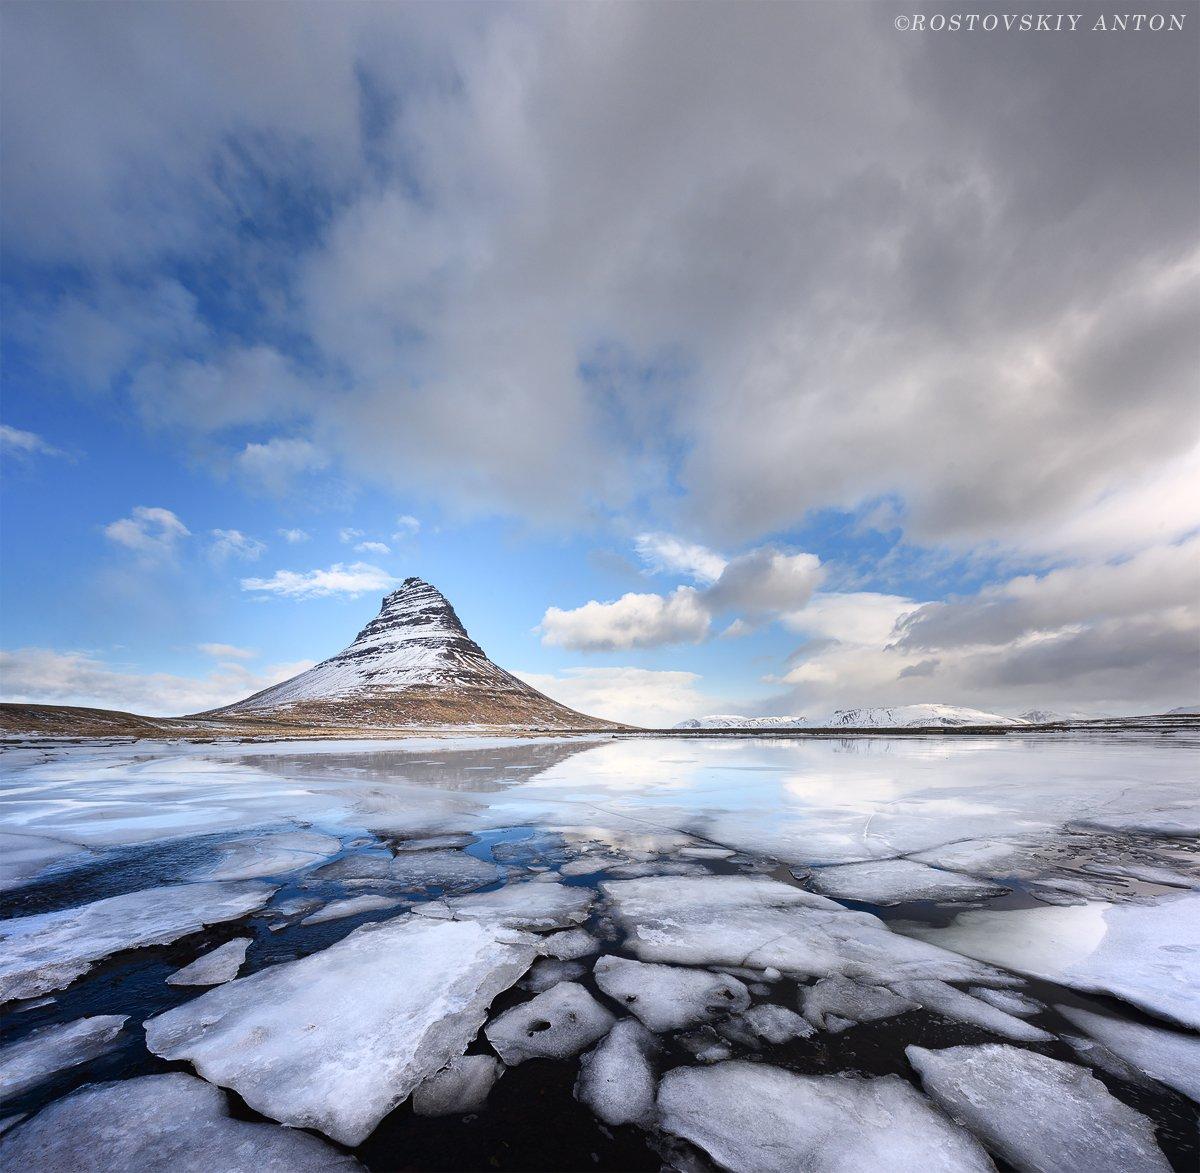 Исландия, лёд, фототур, Kirkjufell, гора, triplaunch, Антон Ростовский